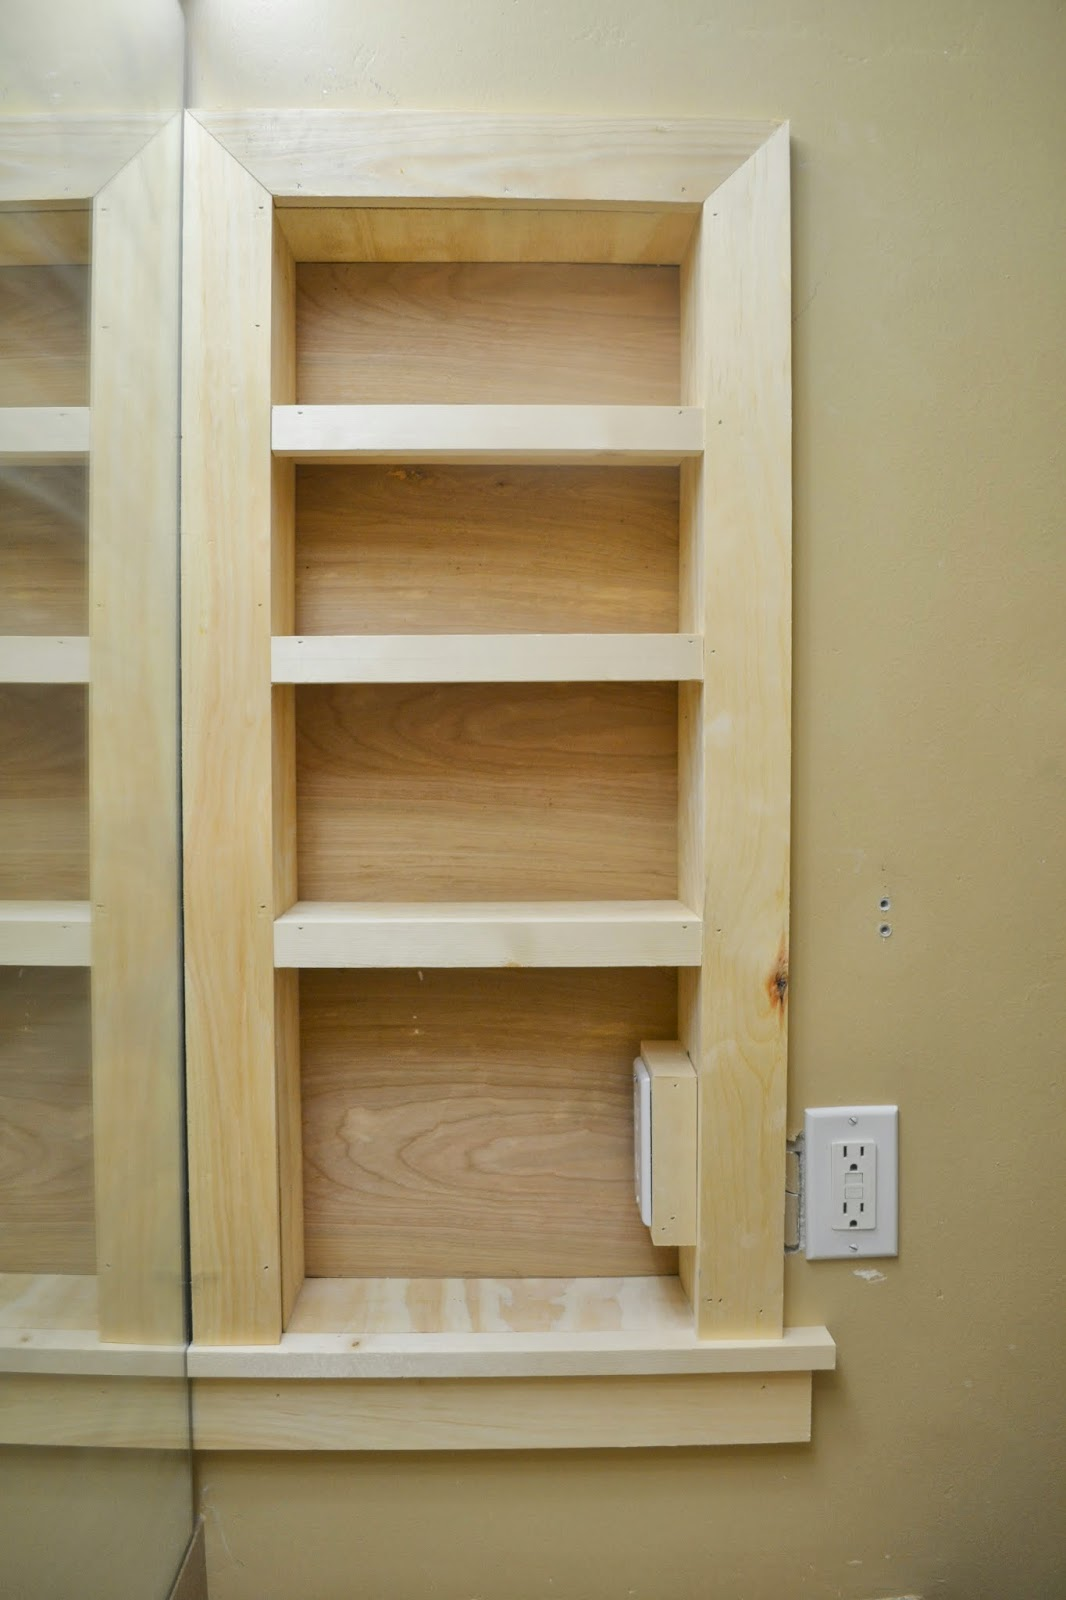 26 Cool Bathroom Shelves Between Studs Eyagci